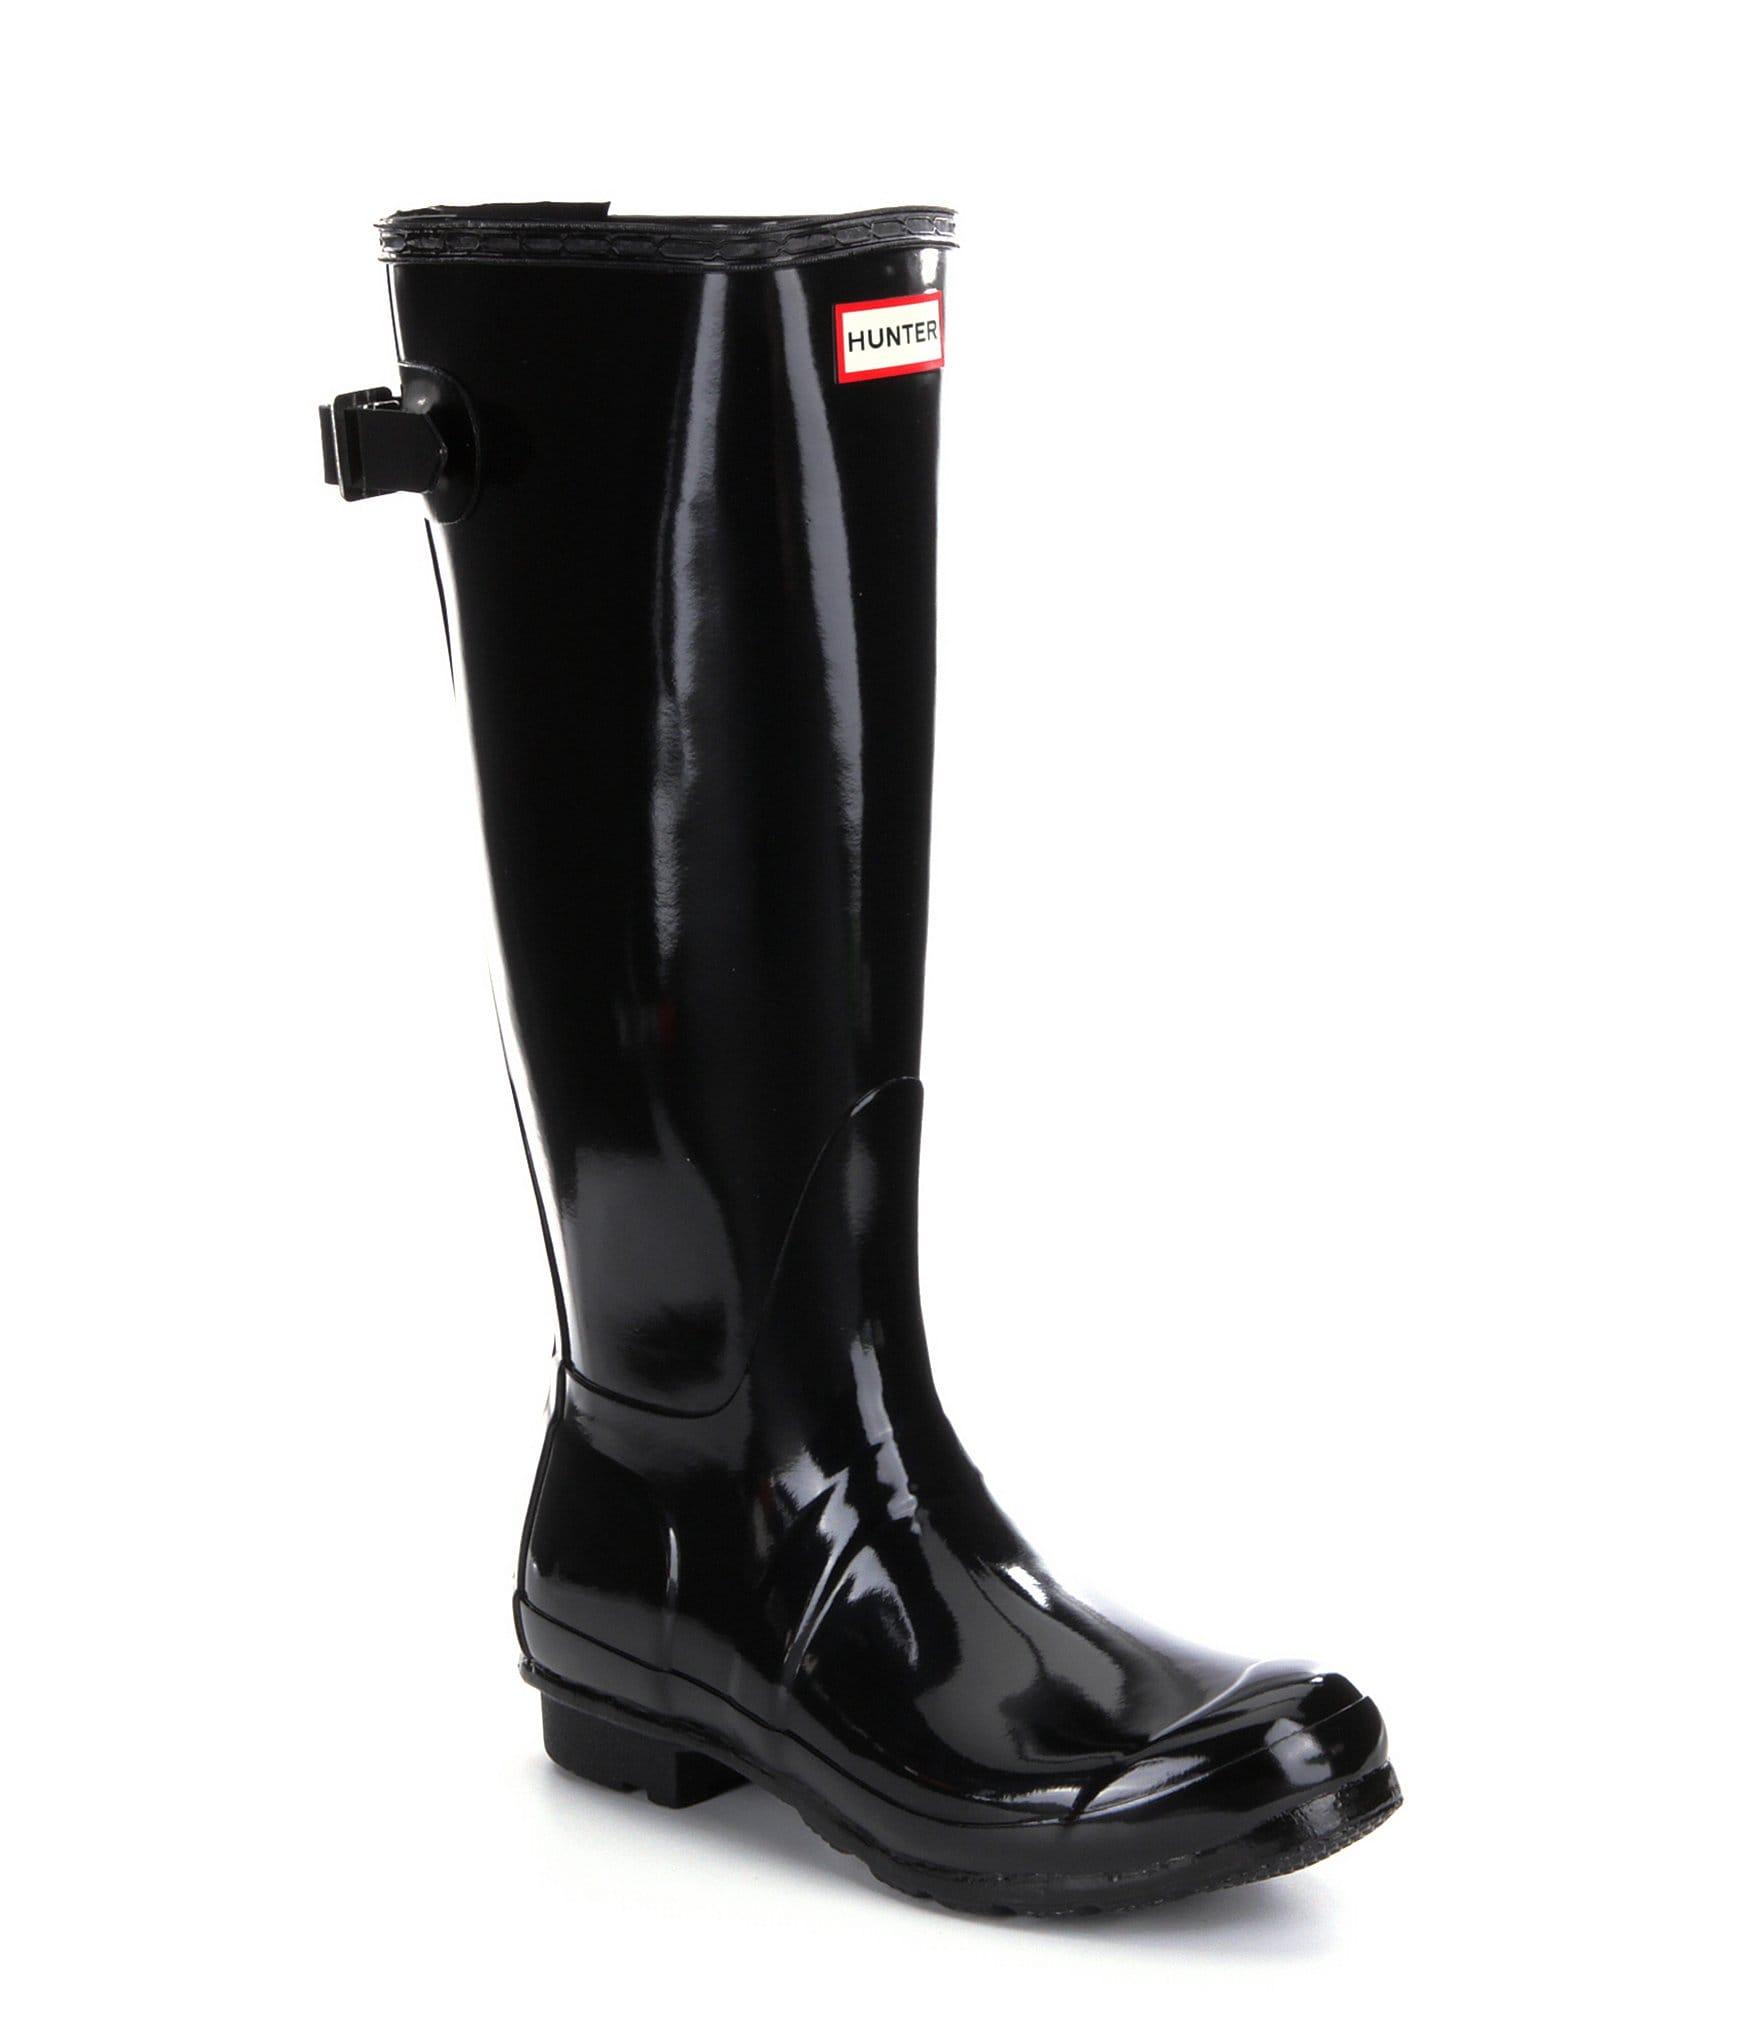 Cool WOMENS HUNTER WELLINGTON BOOTS ORIGINAL TALL GLOSS SNOW WELLIES LADIES UK 3-8 | EBay